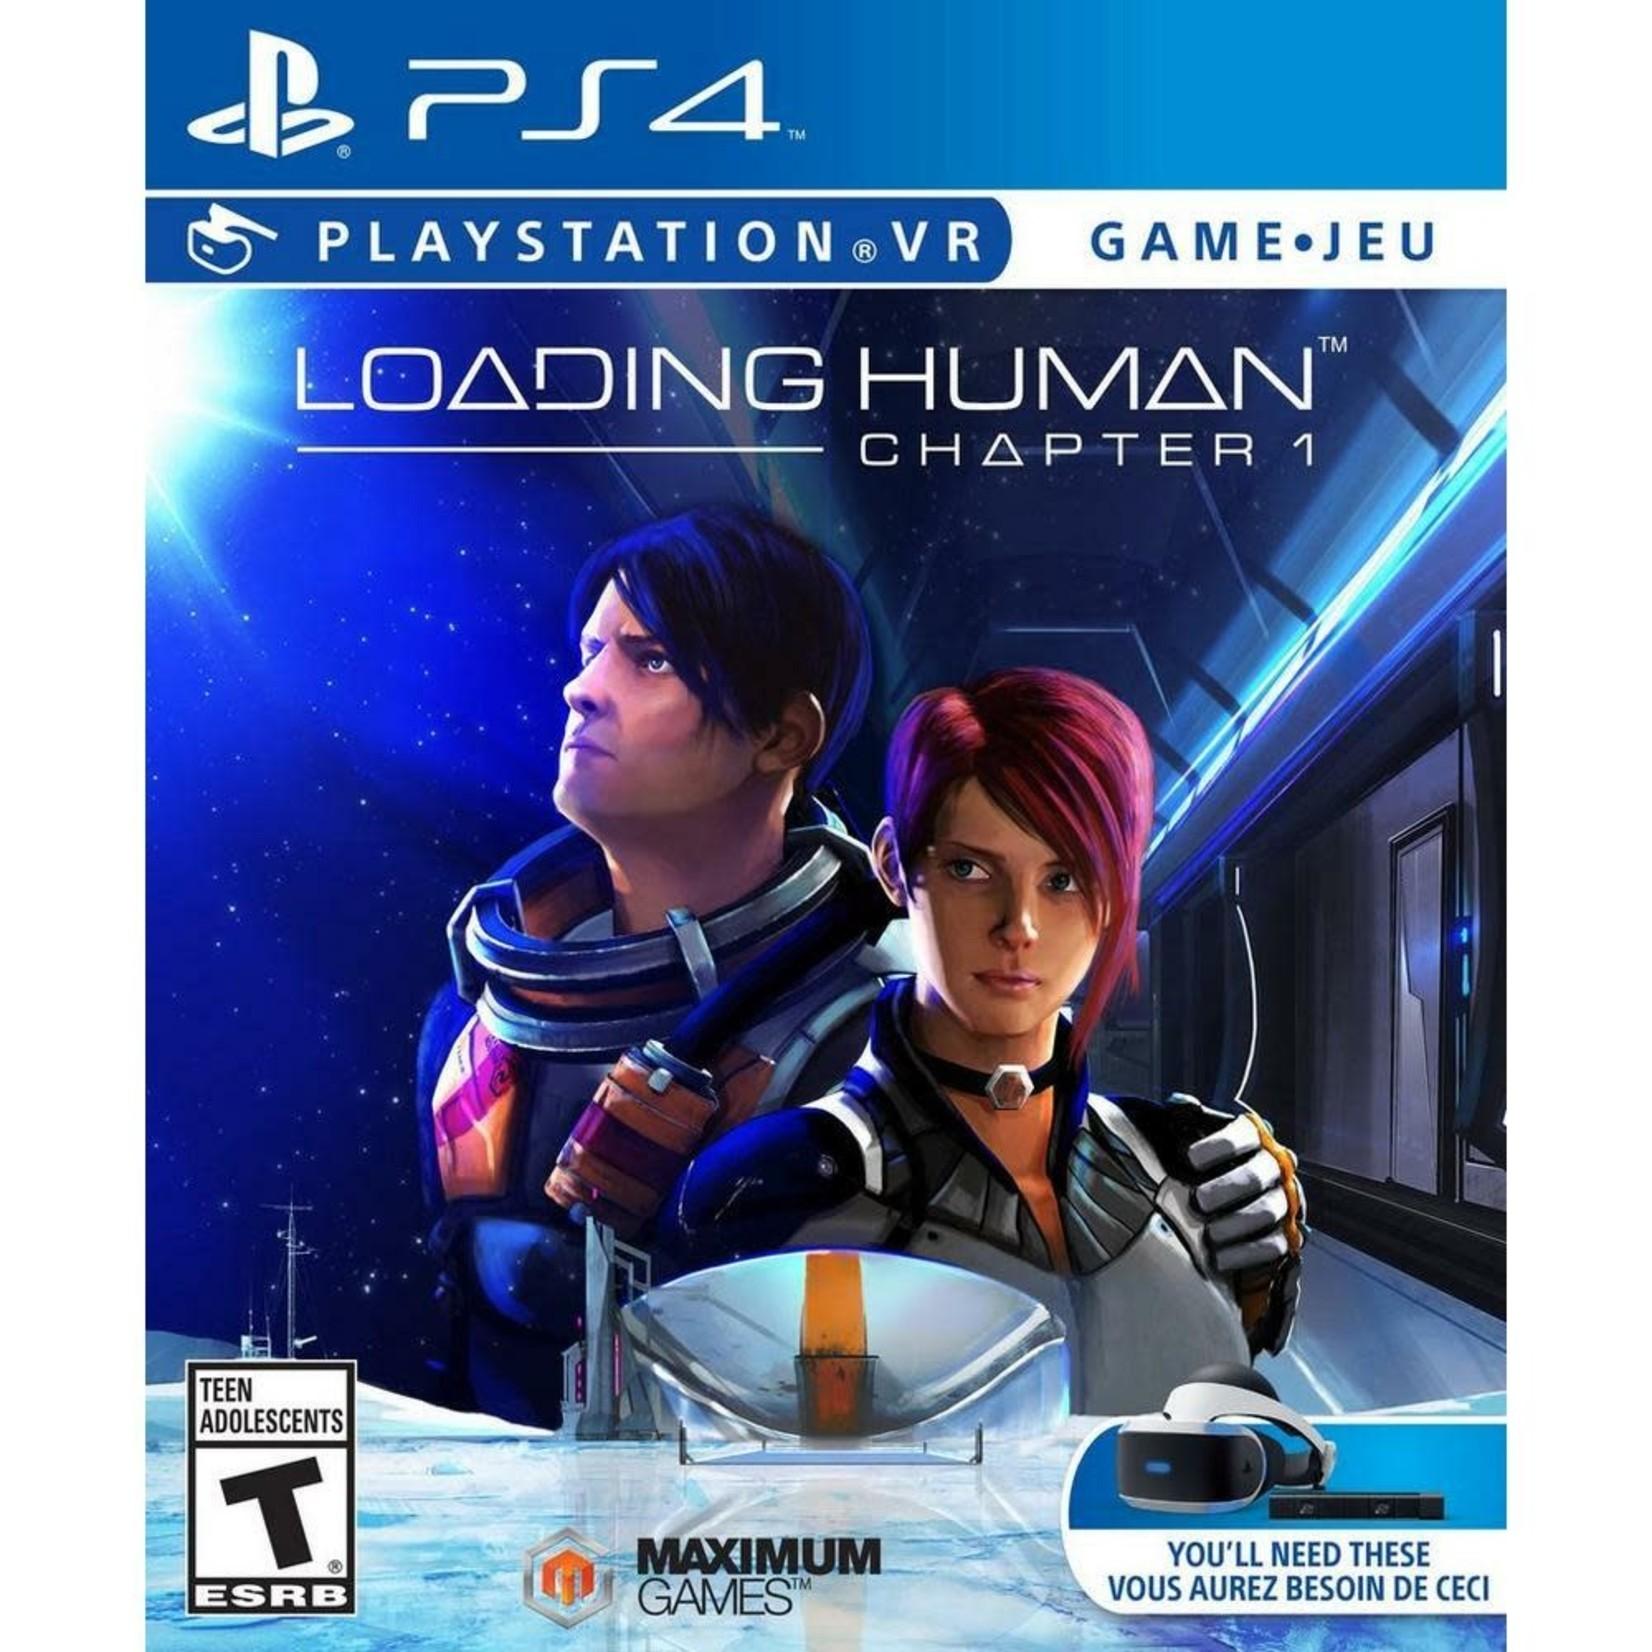 PS4U-Loading Human: Chapter 1